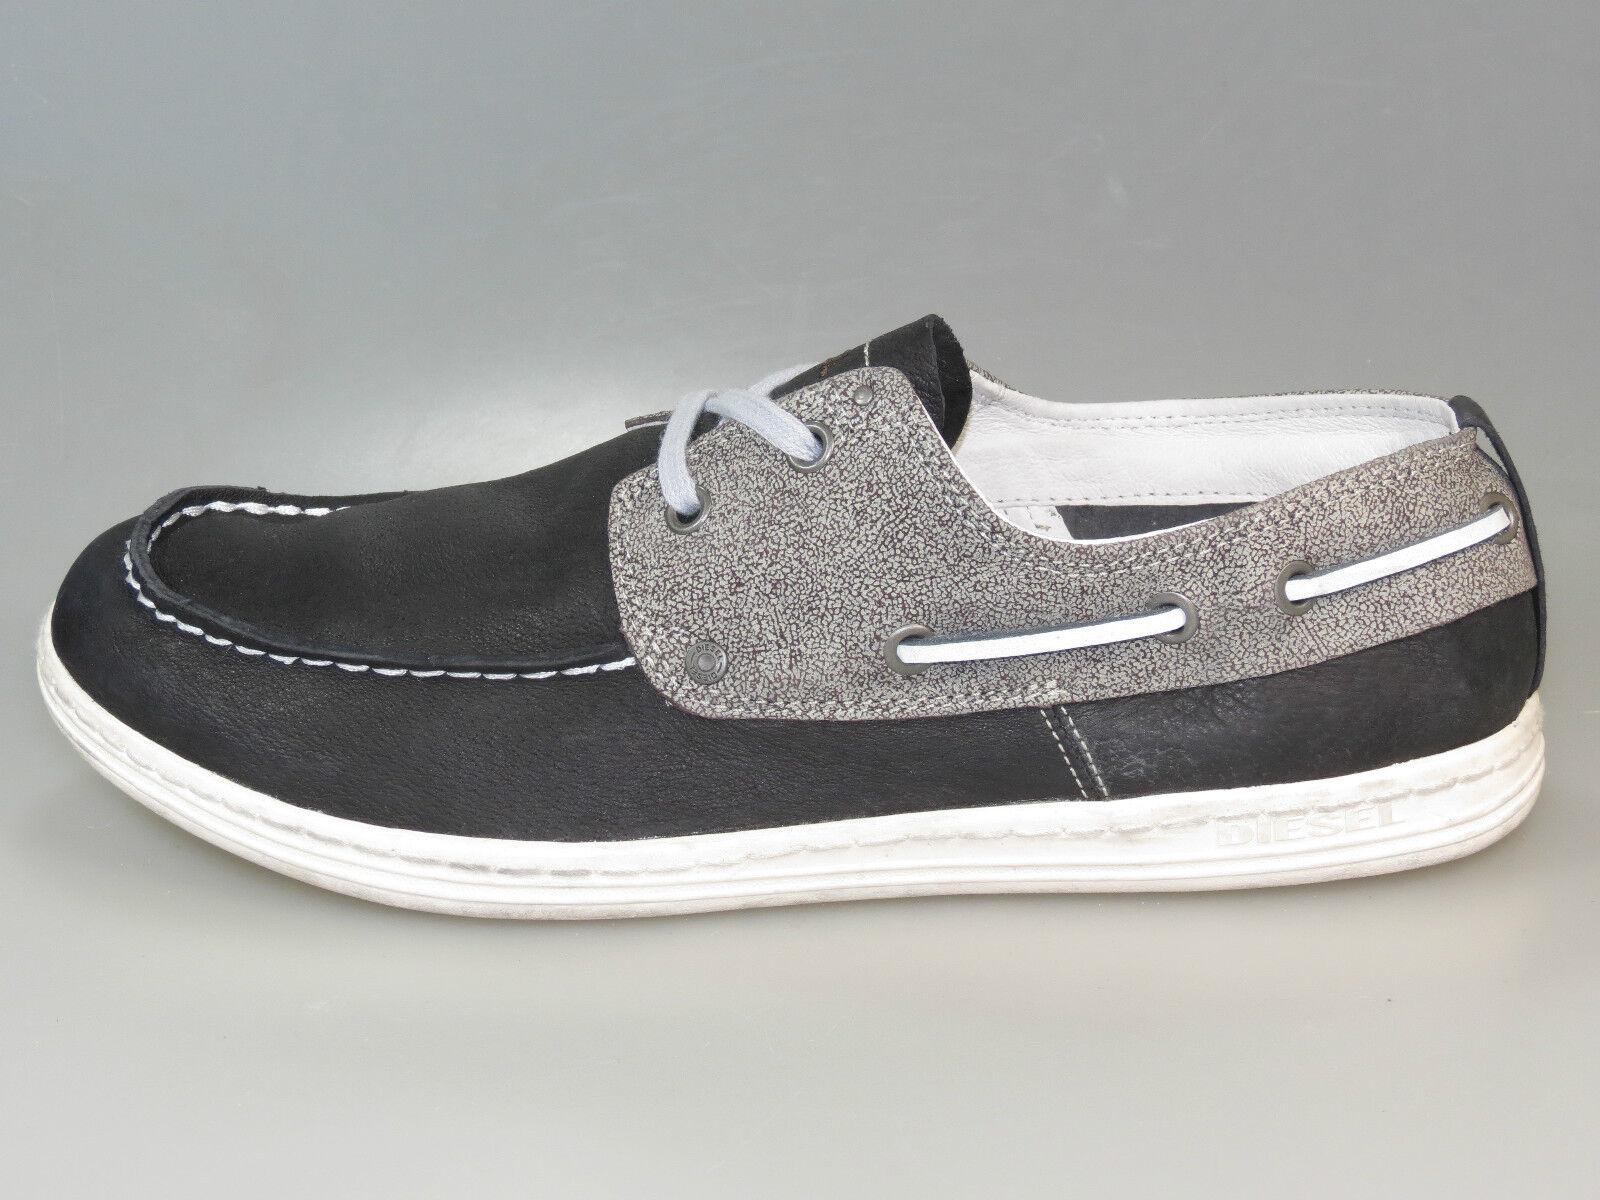 Diesel Schuhe TROPICAL 00YE28 PS046 T2180 MUDD Leder +Neu+ Größe 44 & 45 & 46